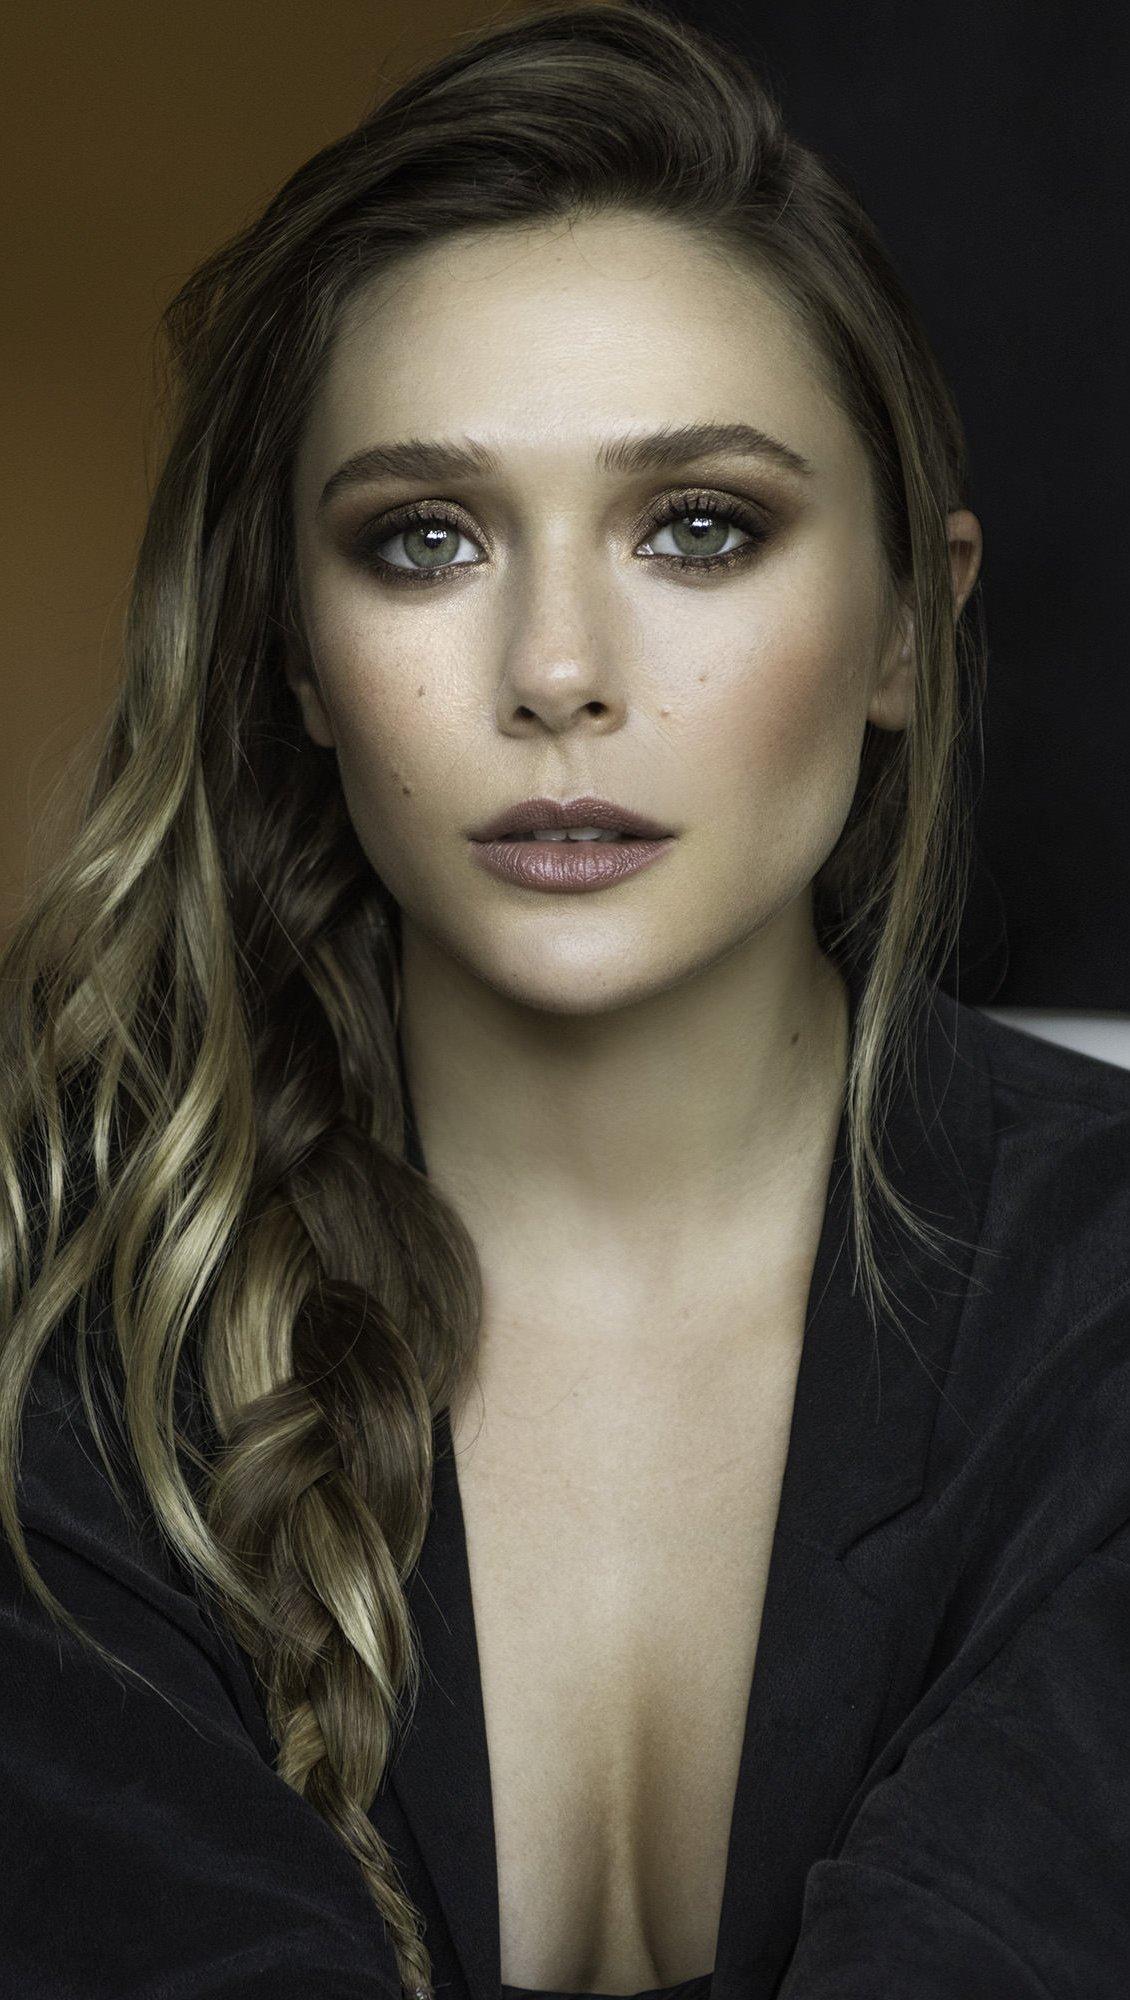 Fondos de pantalla Elizabeth Olsen Vertical